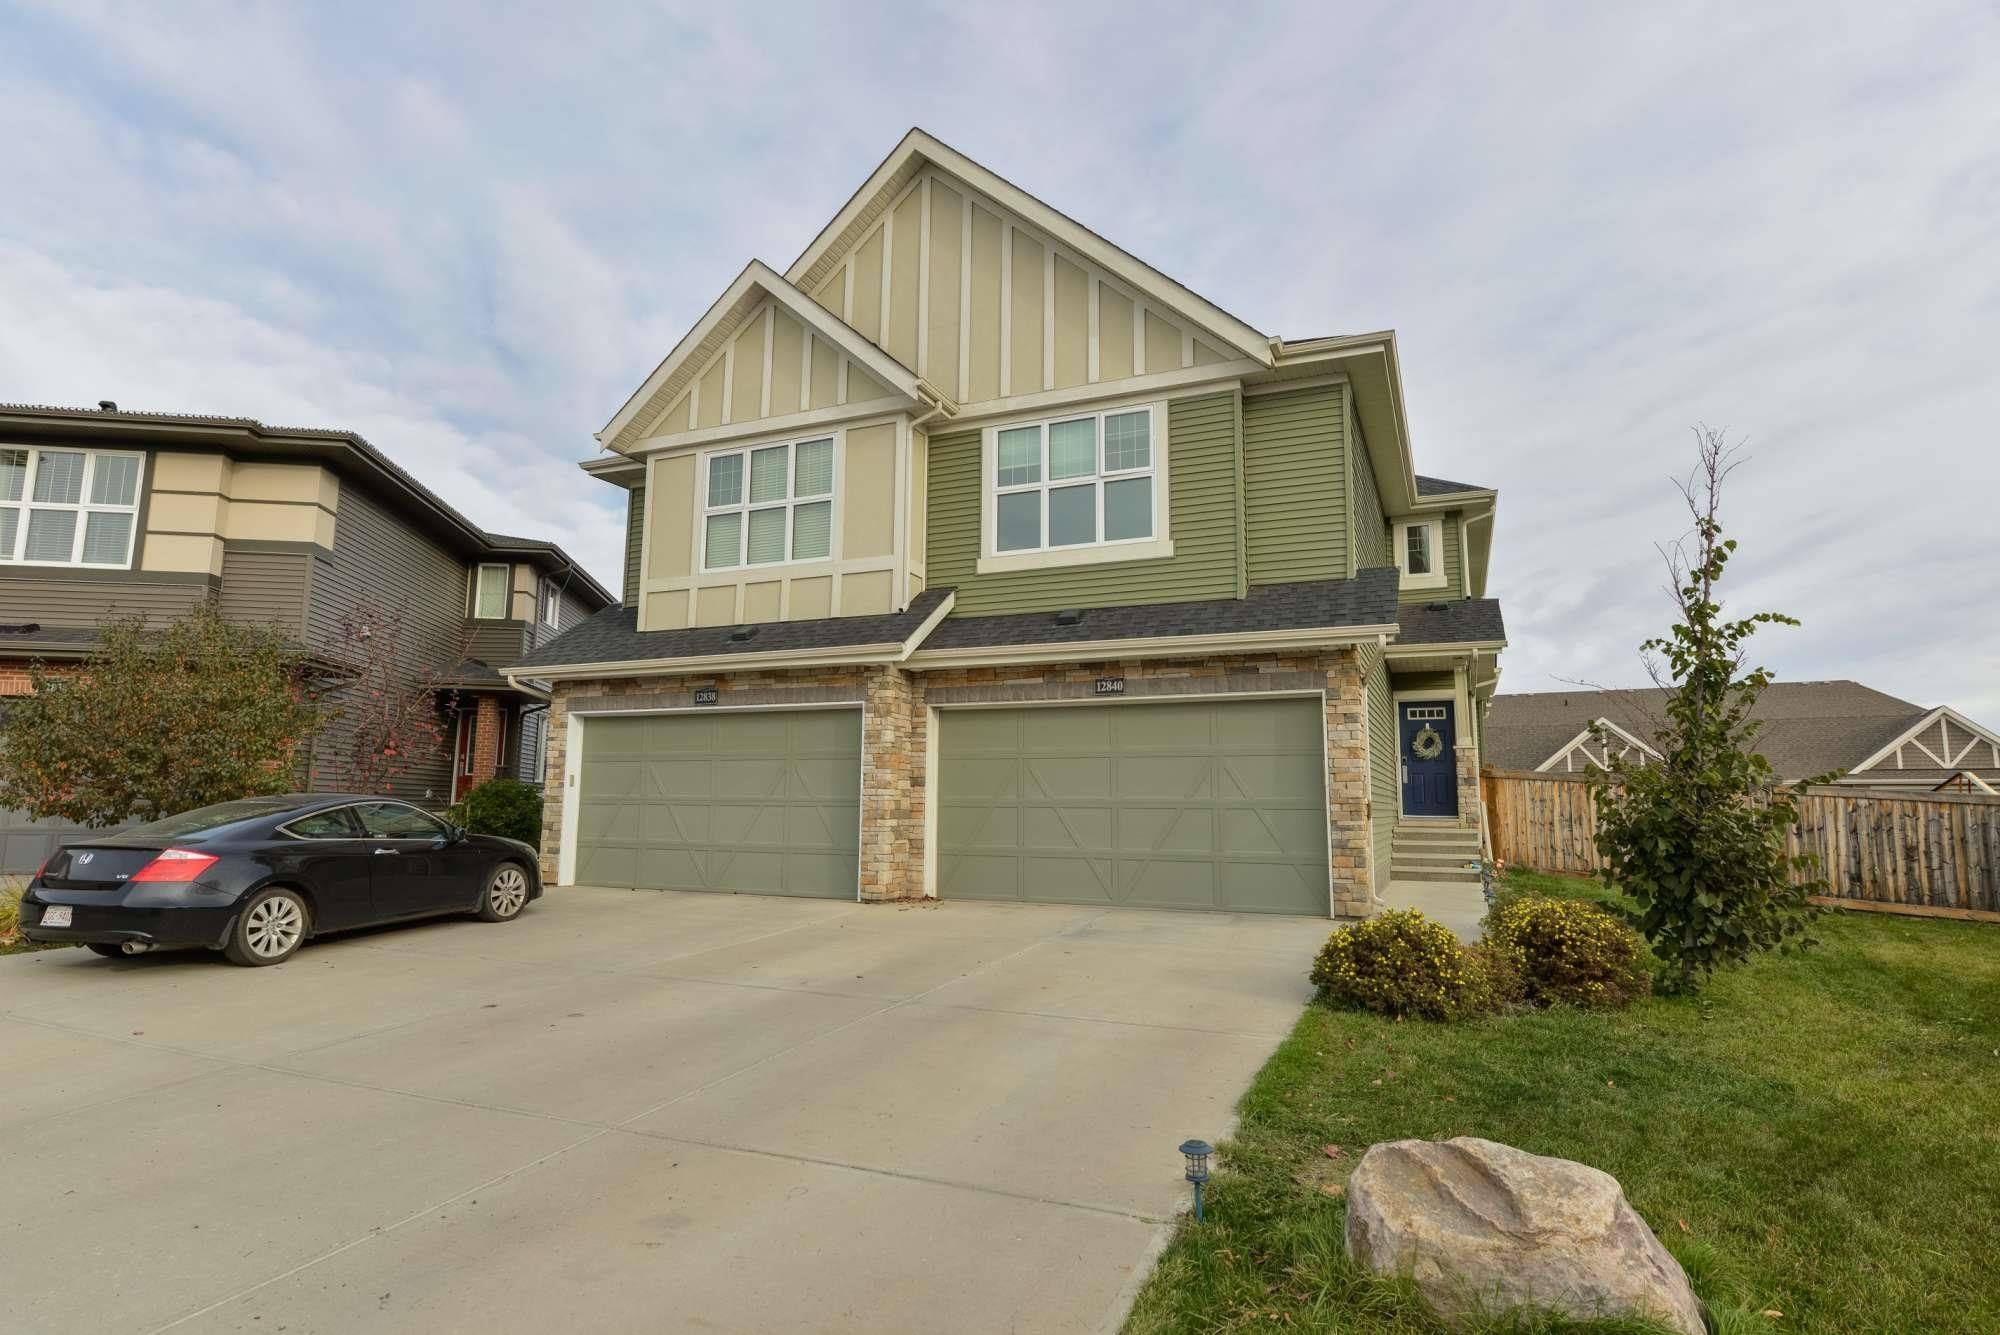 Main Photo: 12840 205 Street in Edmonton: Zone 59 House Half Duplex for sale : MLS®# E4265998